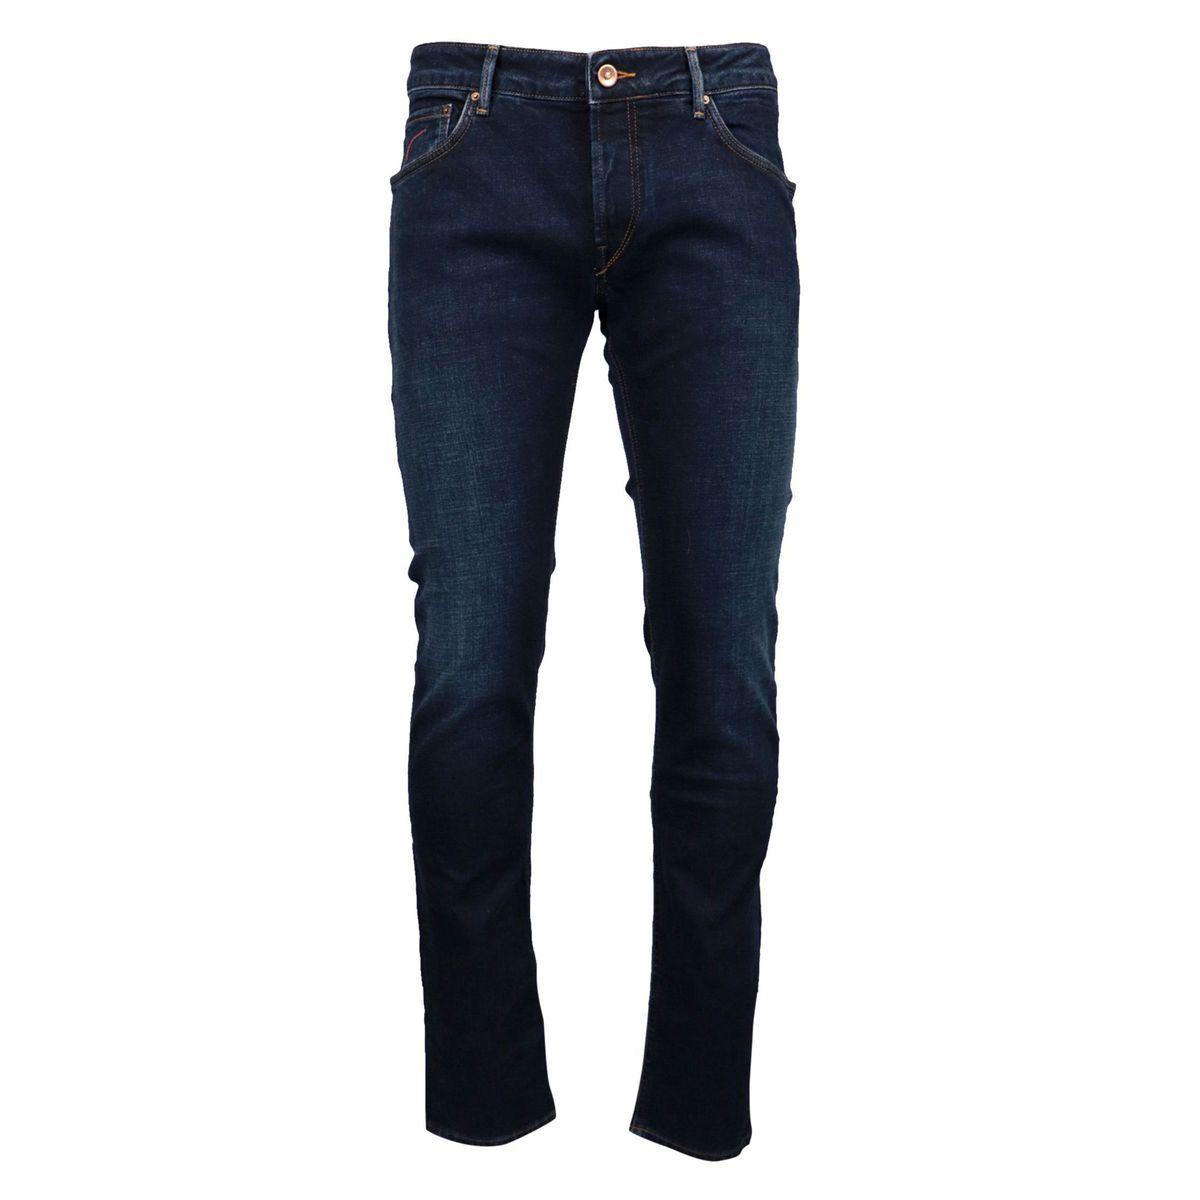 Orvieto jeans in dark denim stretch slim fit Dark denim Hand Picked